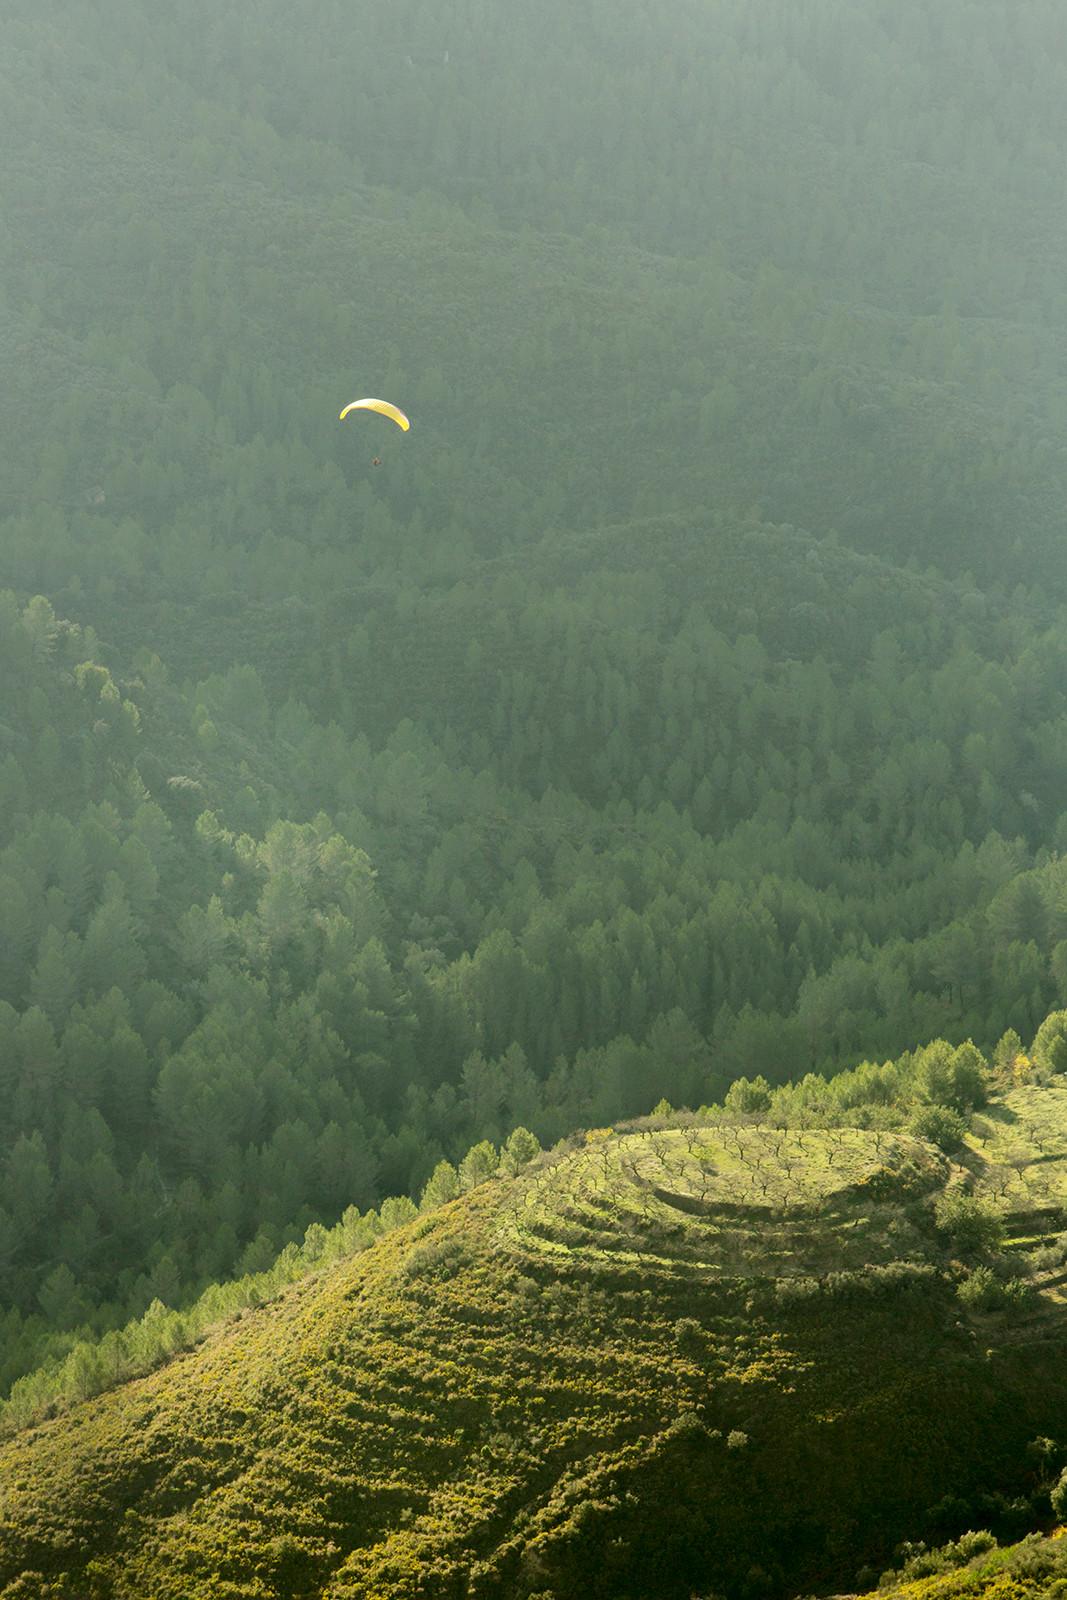 Paraglider, Sierra de Bernia, Tarbena